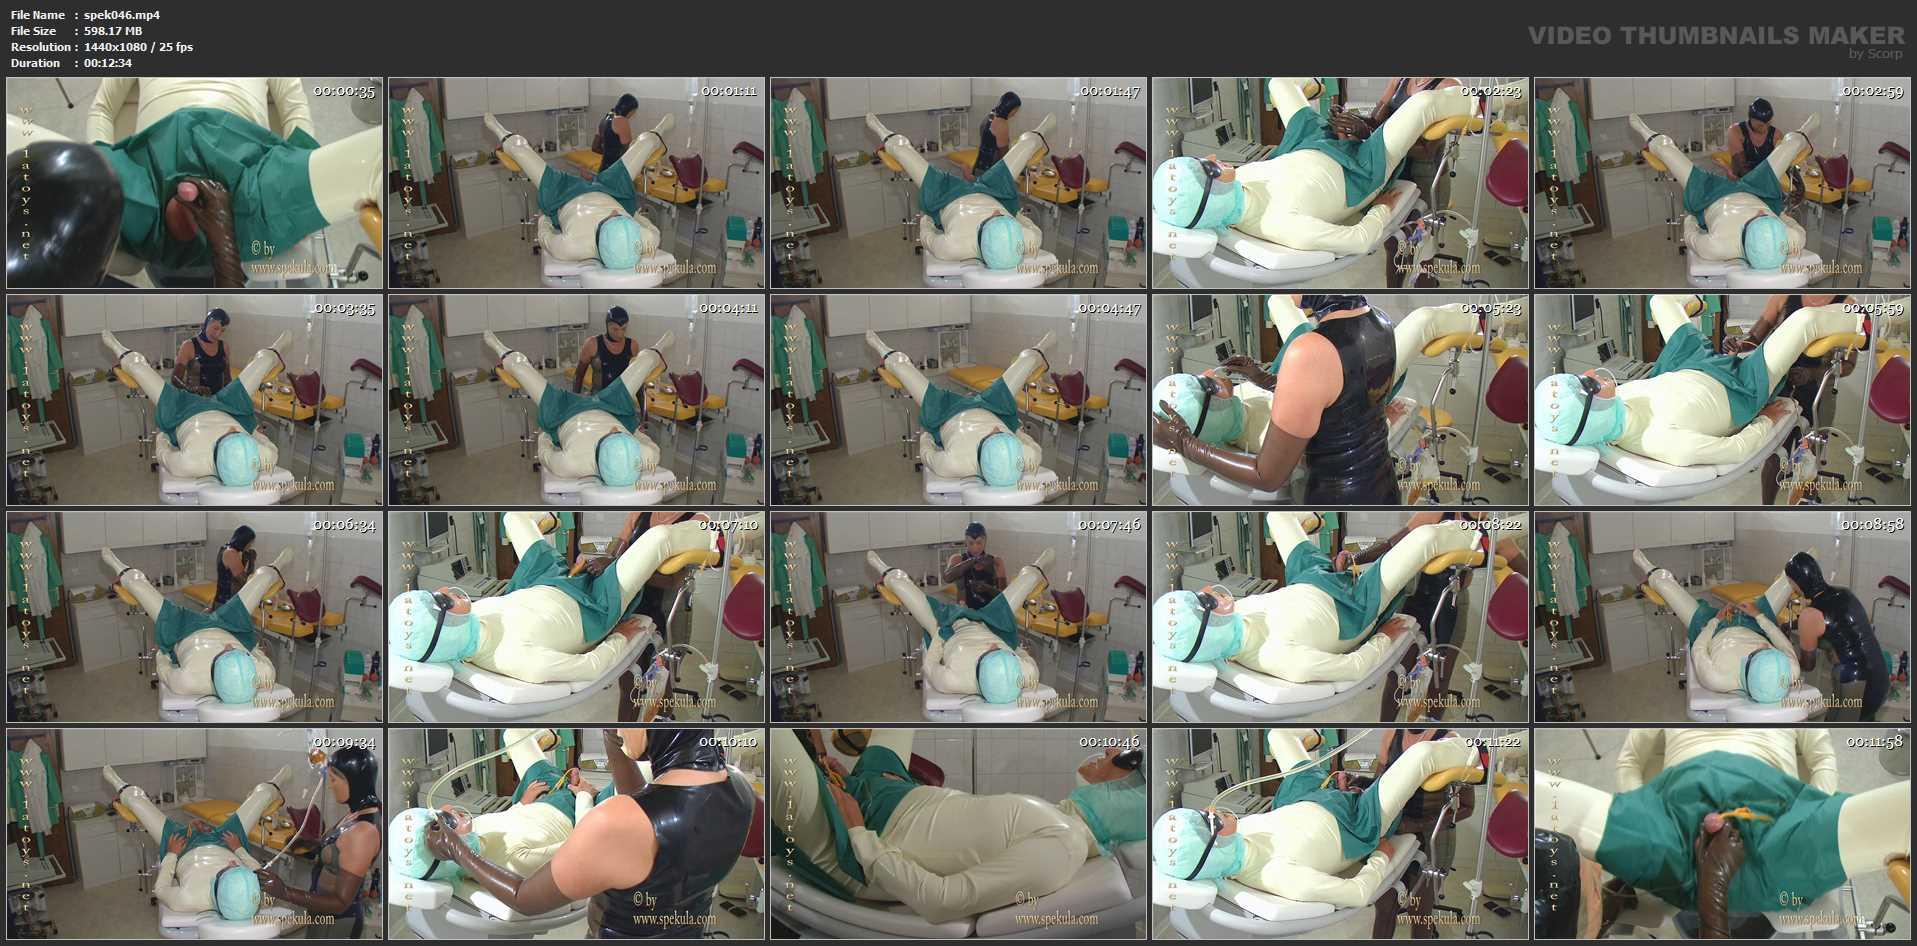 [SPEKULA] Different catheter Part 2 [FULL HD][1080p][MP4]